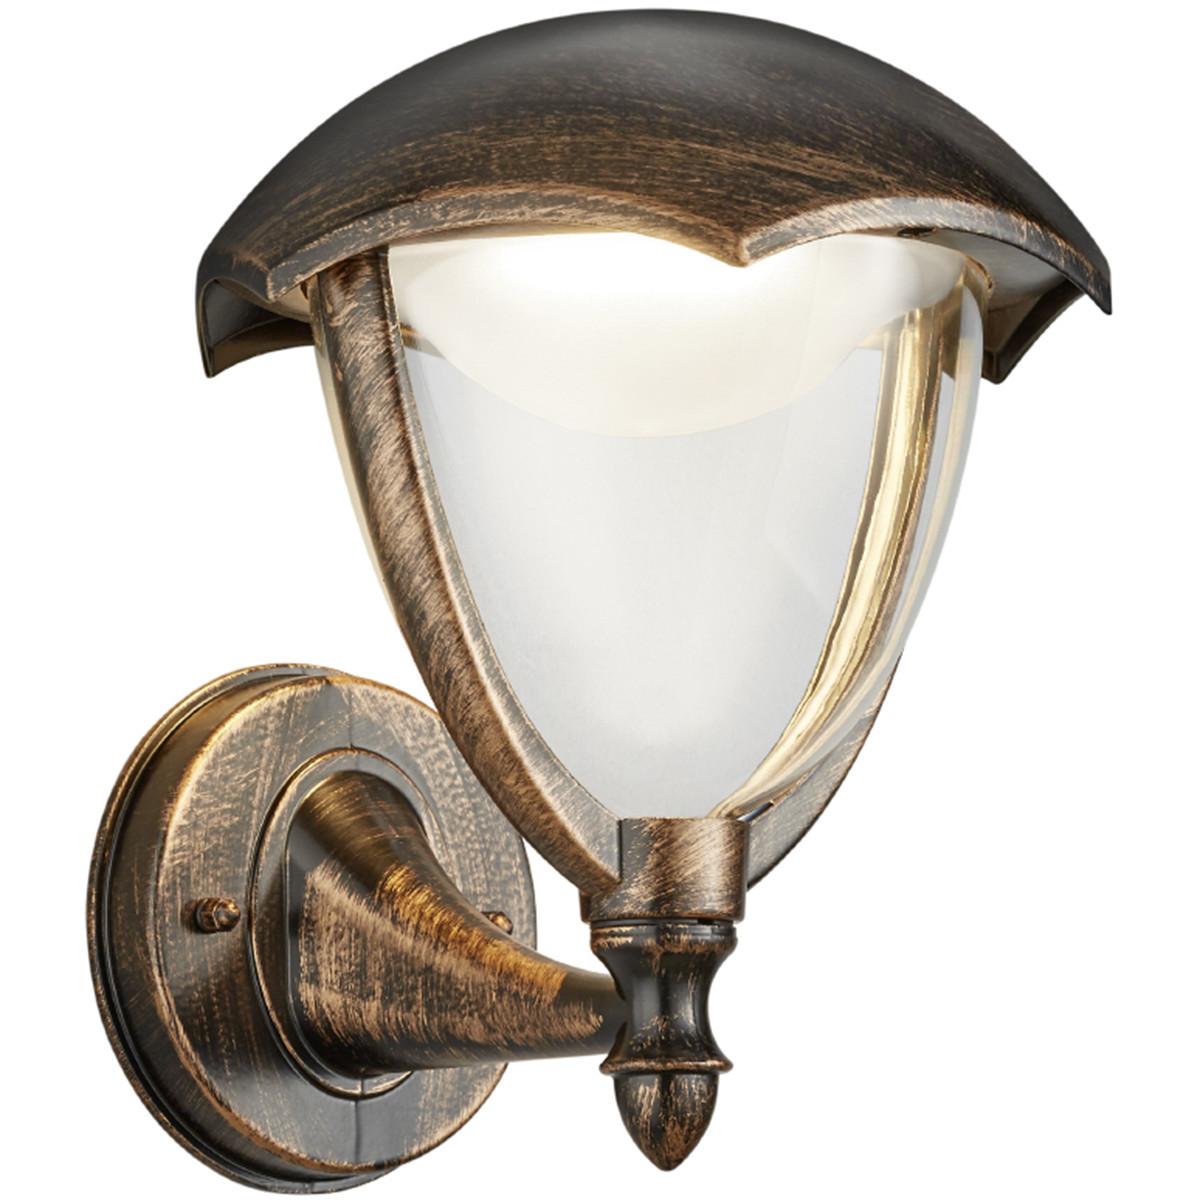 LED Tuinverlichting - Tuinlamp - Trion Grichto - Wand Omhoog - 6W - Antiek Roestkleur - Aluminium